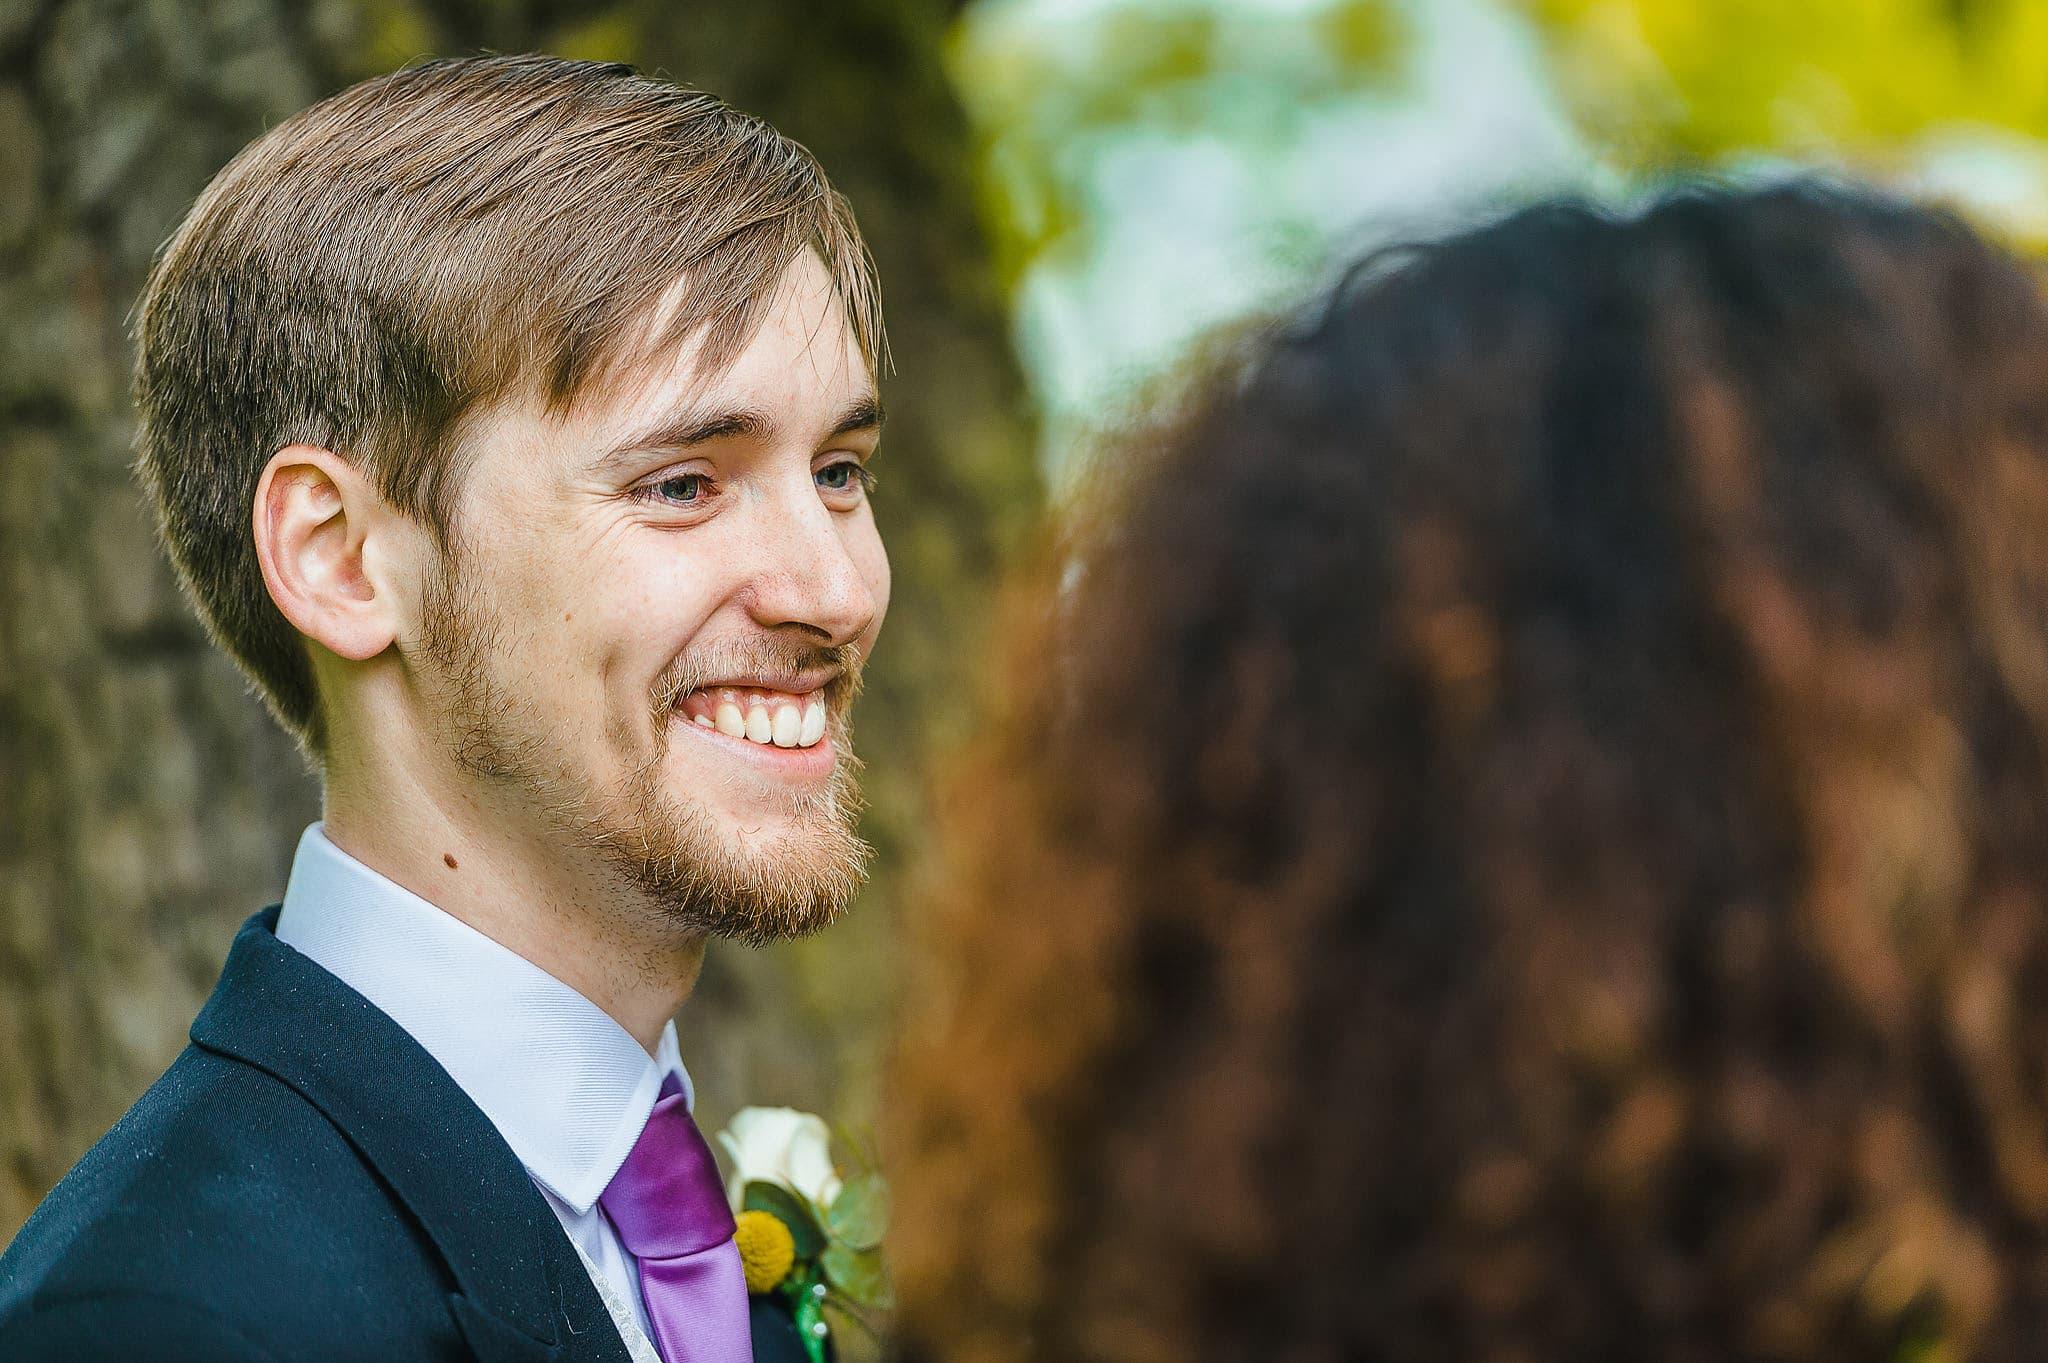 wedding-photographers-west-midlands (85)